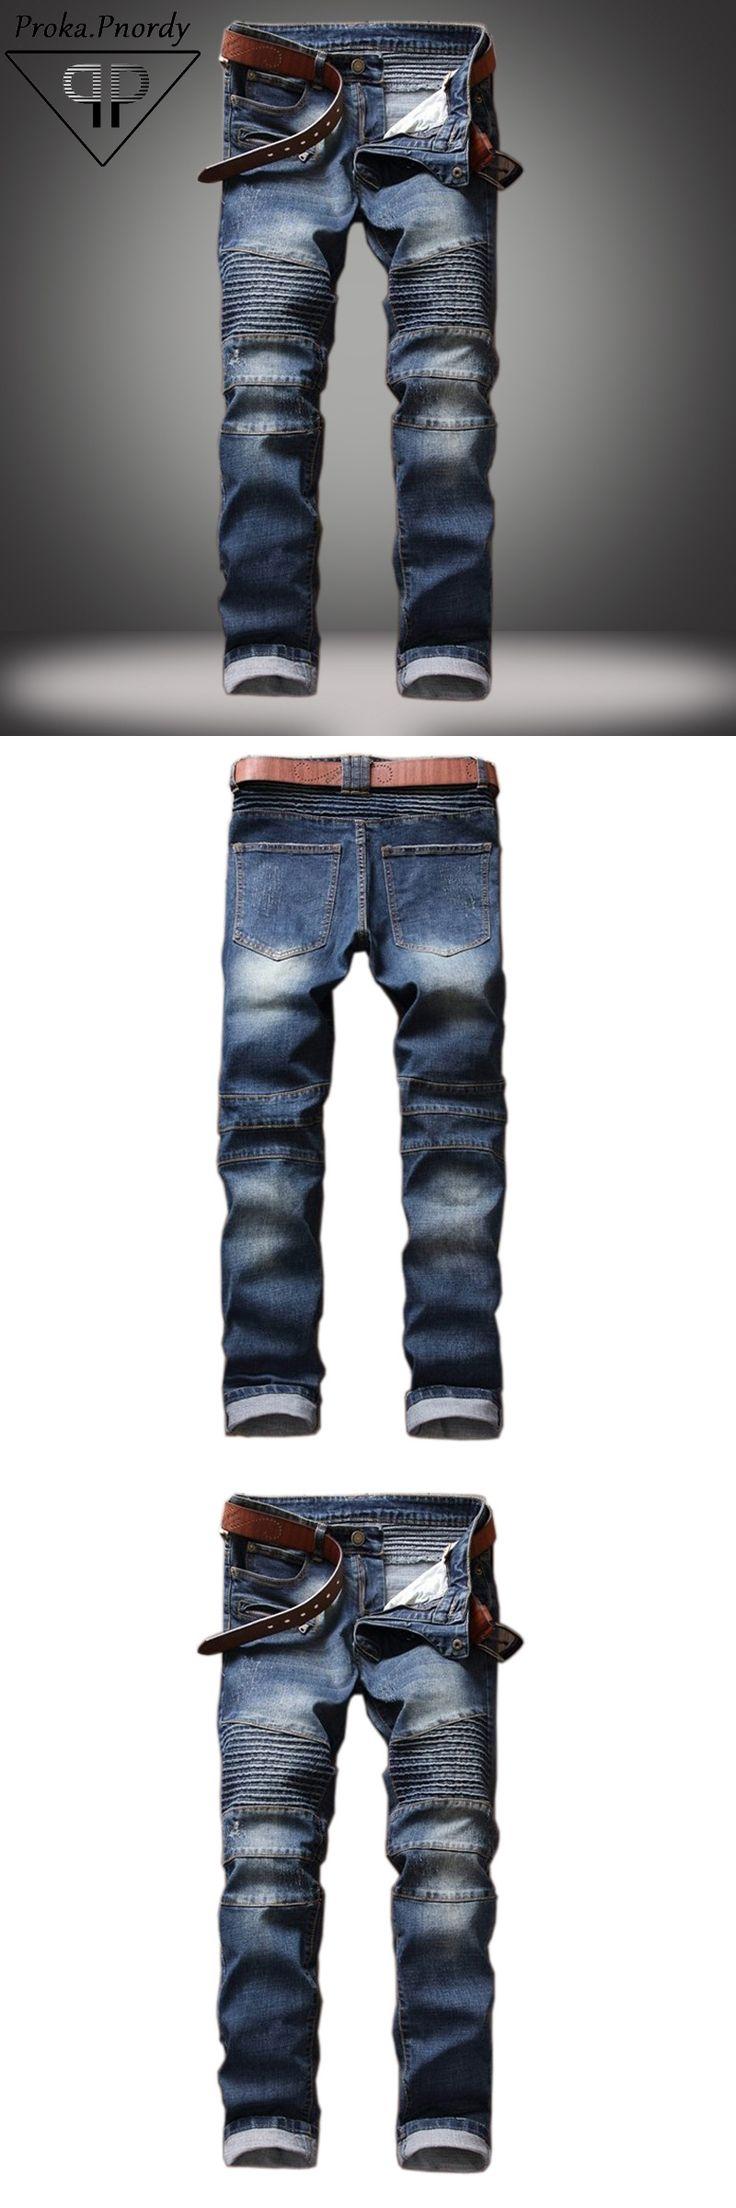 2017 Proka Pnordy Men's Classic Jeans Knee Drape Panel Moto Biker Jeans Men Skinny Slim Jeans Male Hip Hop Denim Jeans Homme